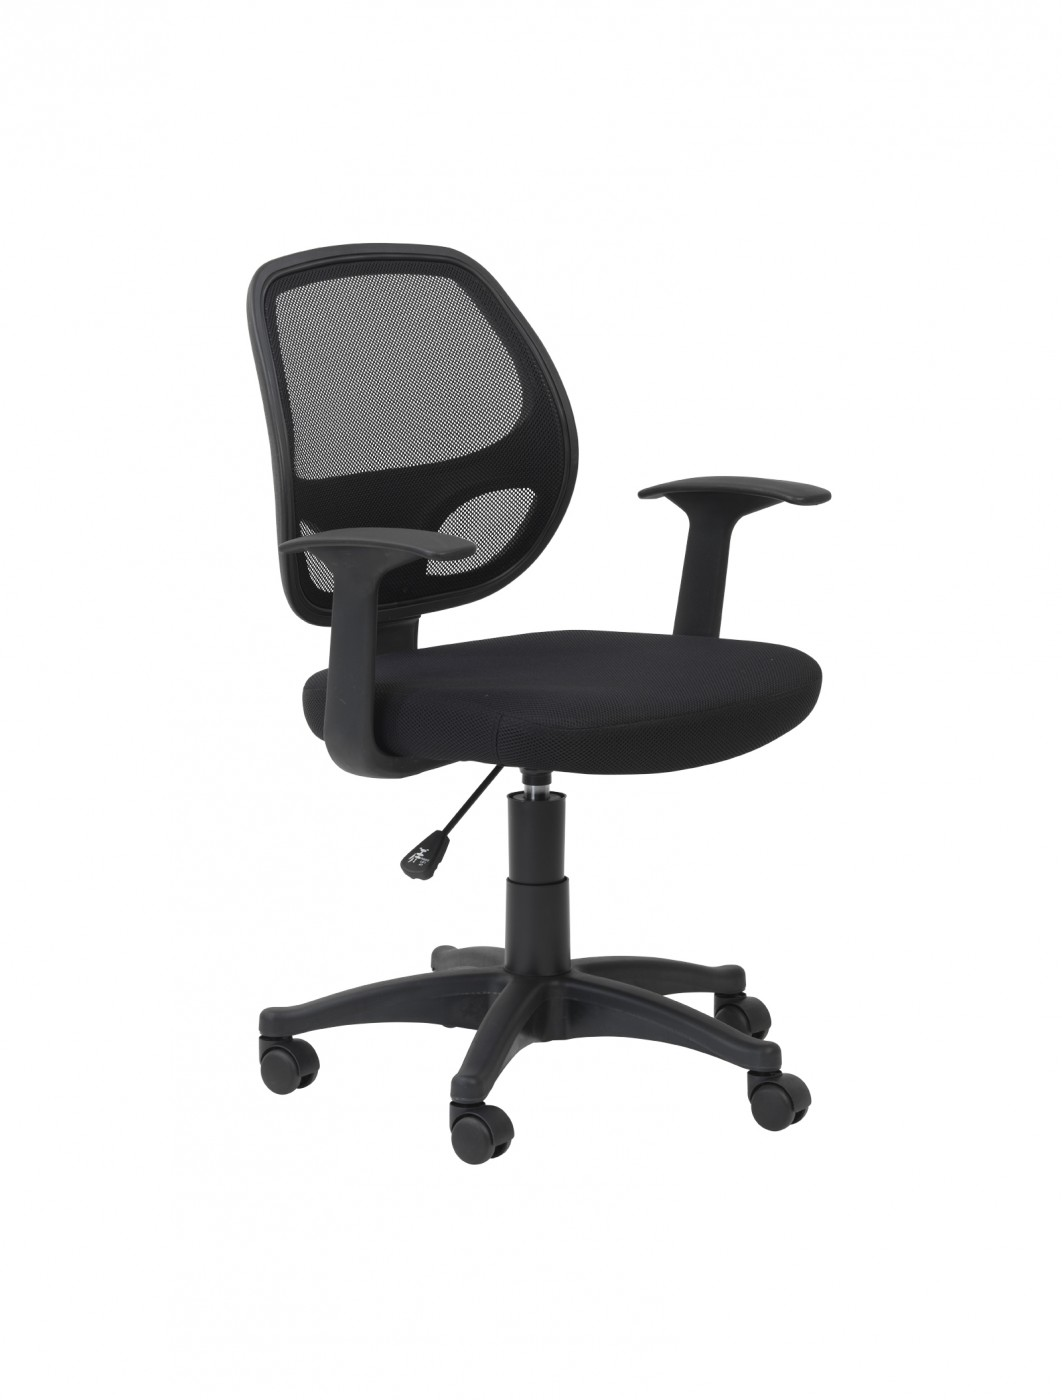 alphason davis office chairs aoc9118-m-bk   121 office furniture